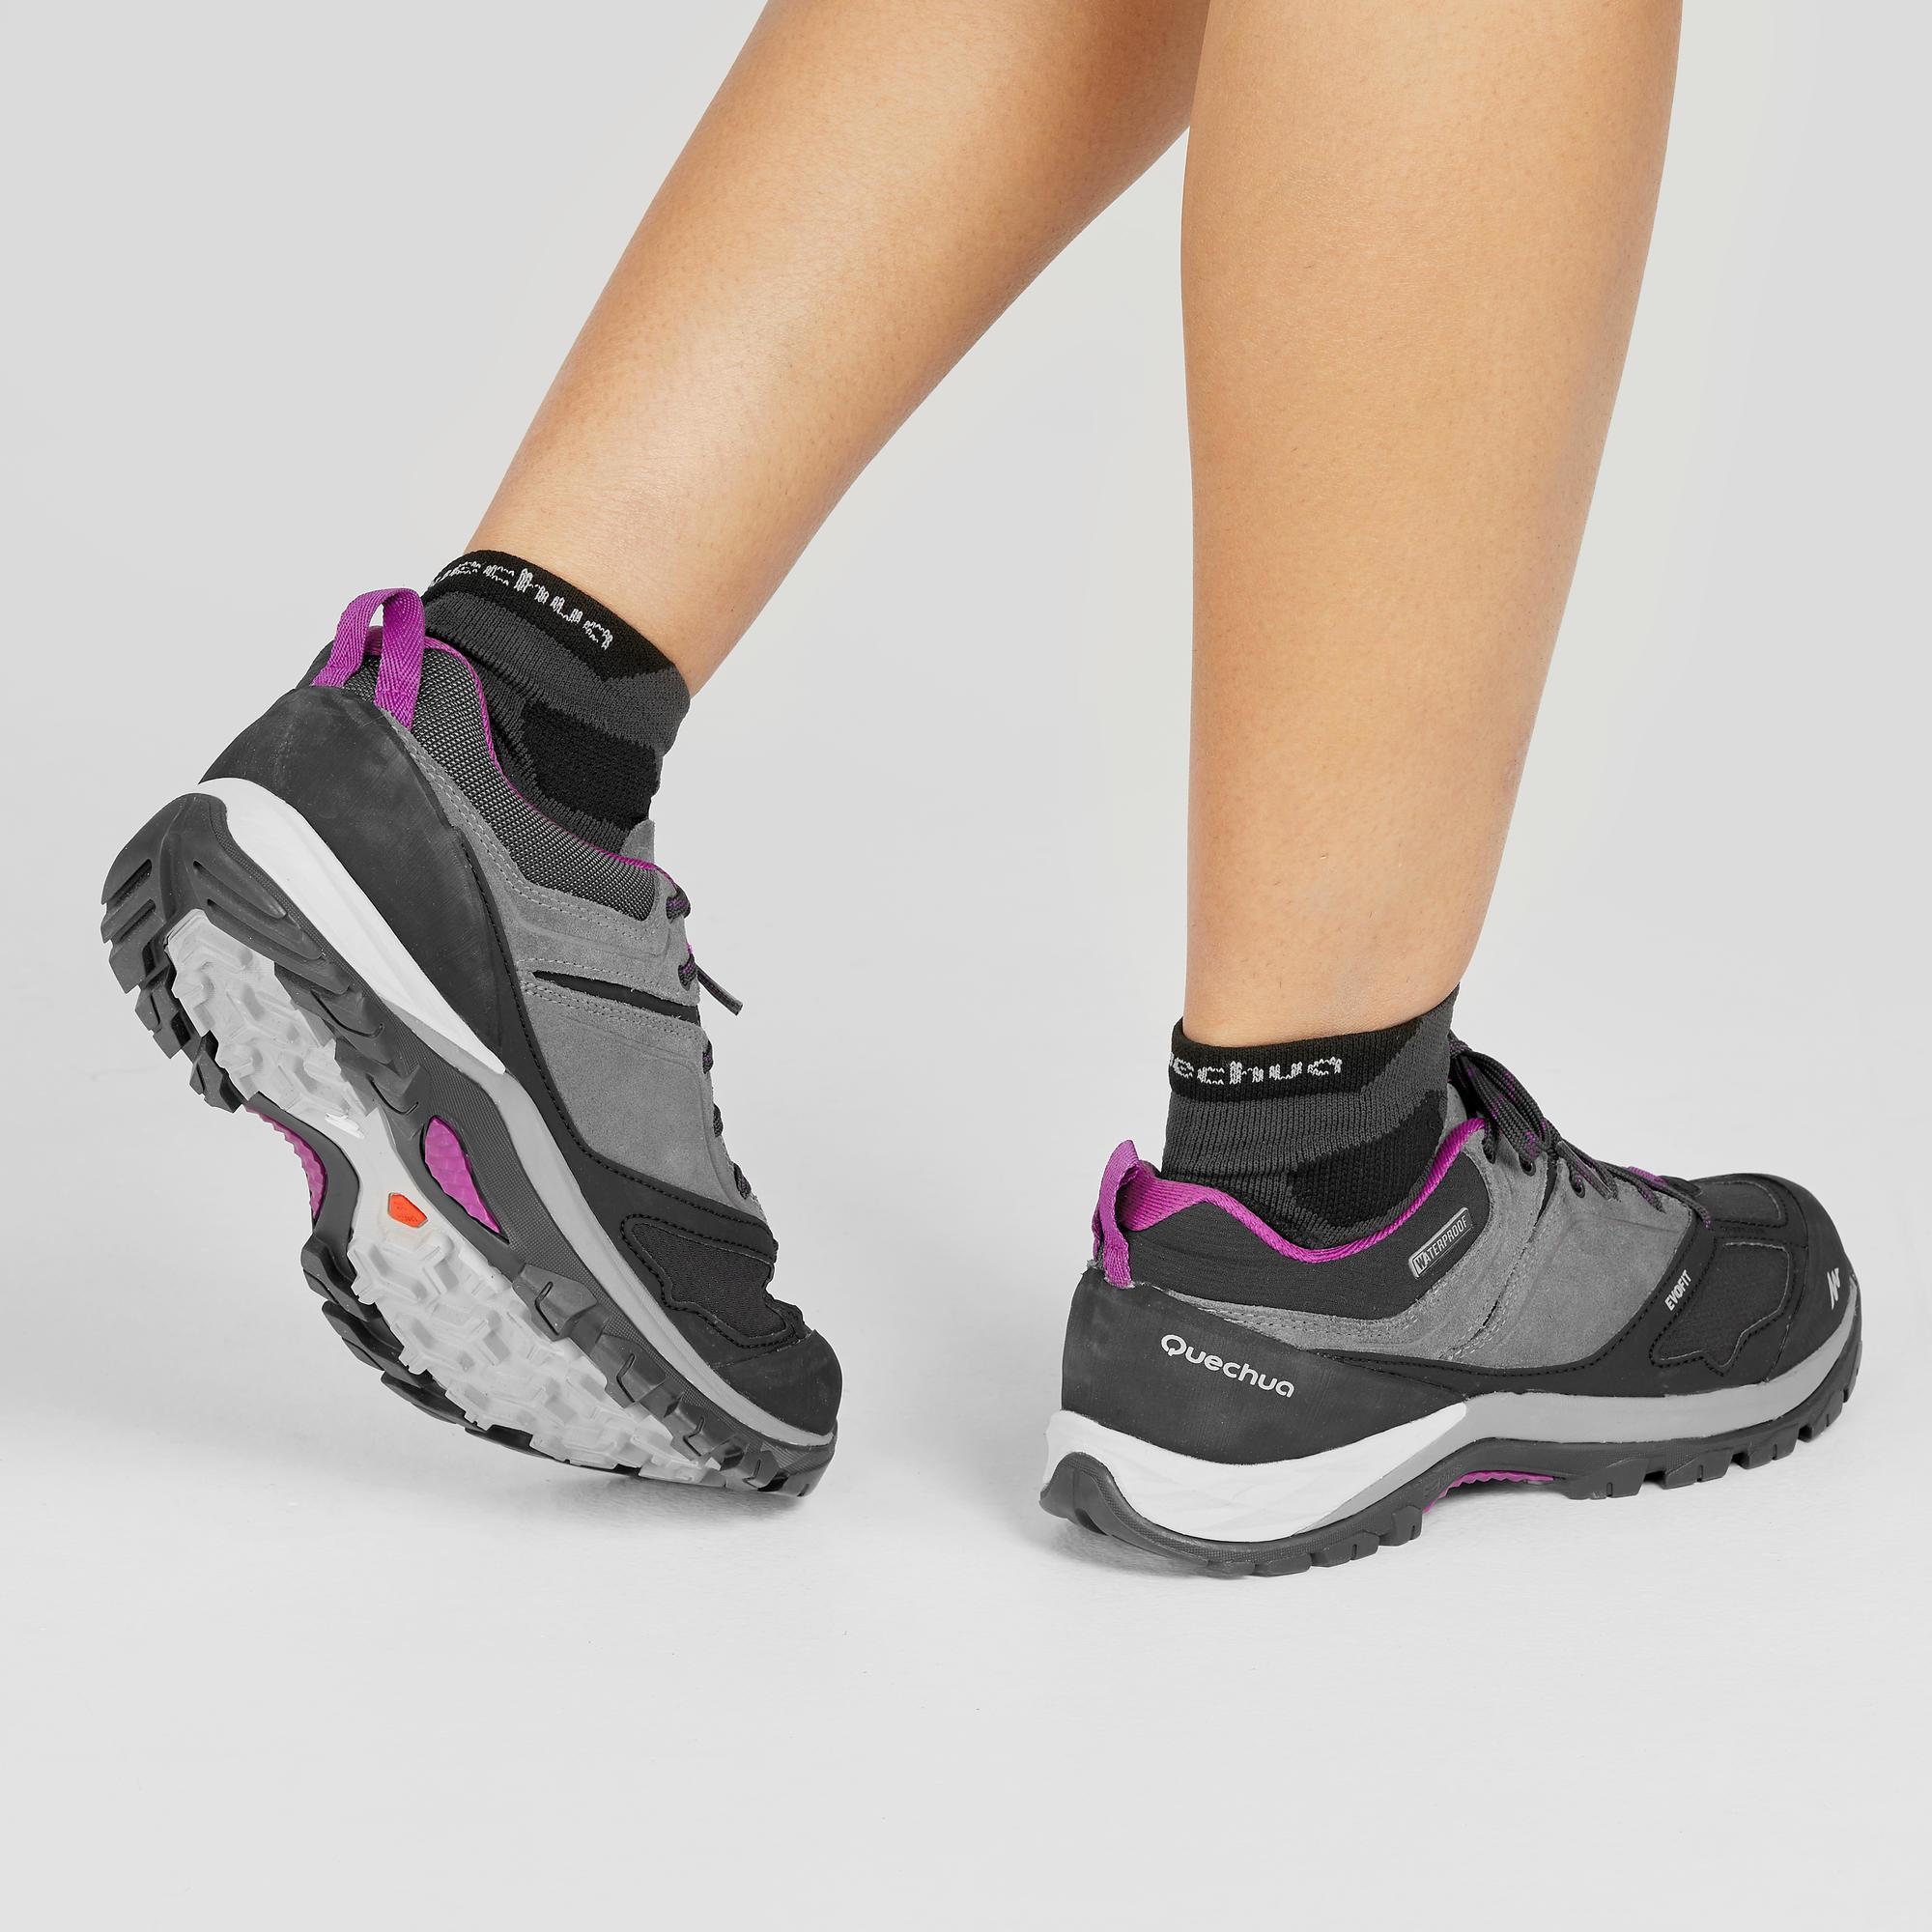 549db8f42c5 Zapatillas de senderismo en montaña mujer impermeables gris violeta jpg  700x700 Mh500 quechua montaña de zapatillas